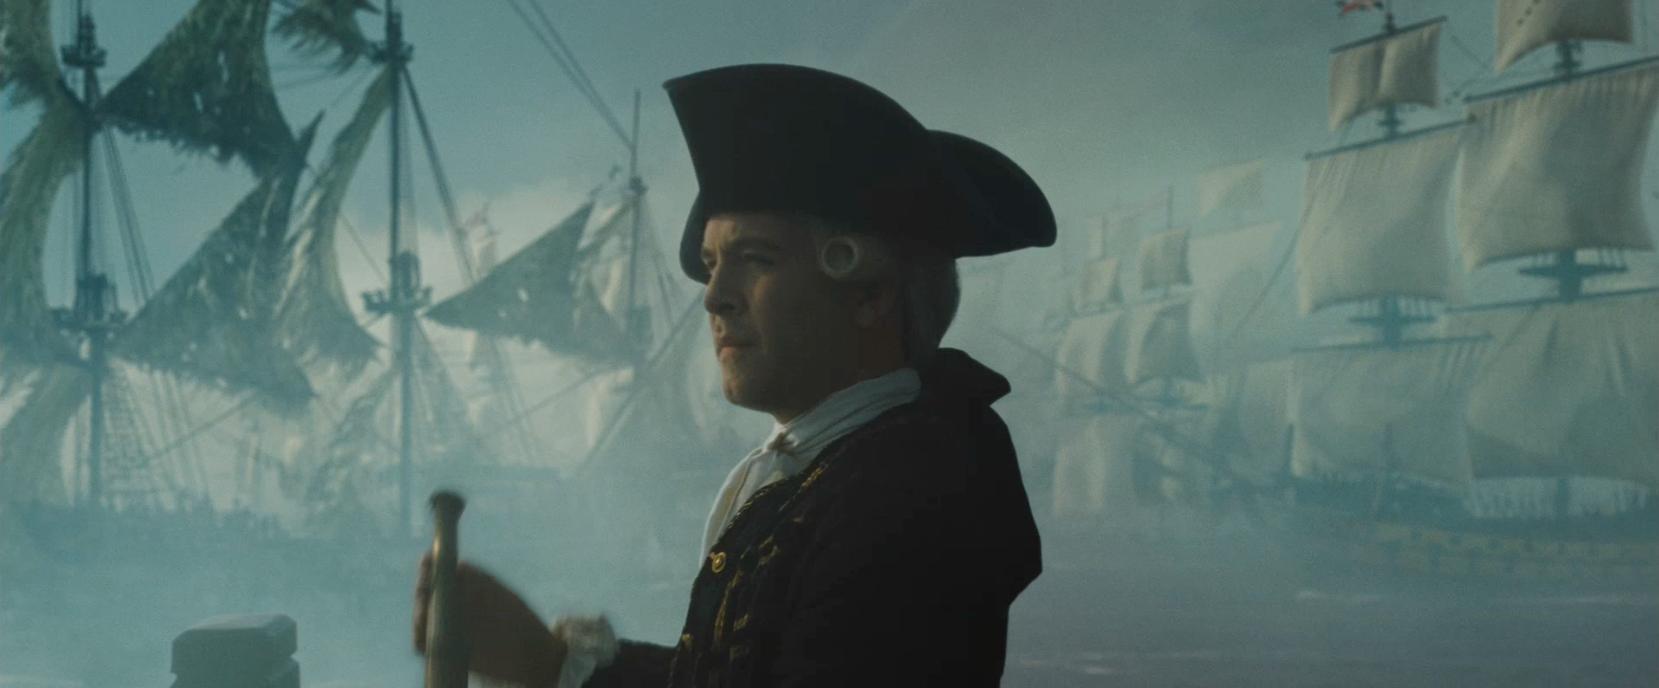 Cutler Beckett Pirates Of The Caribbean Caribbean Johnny Depp And Winona